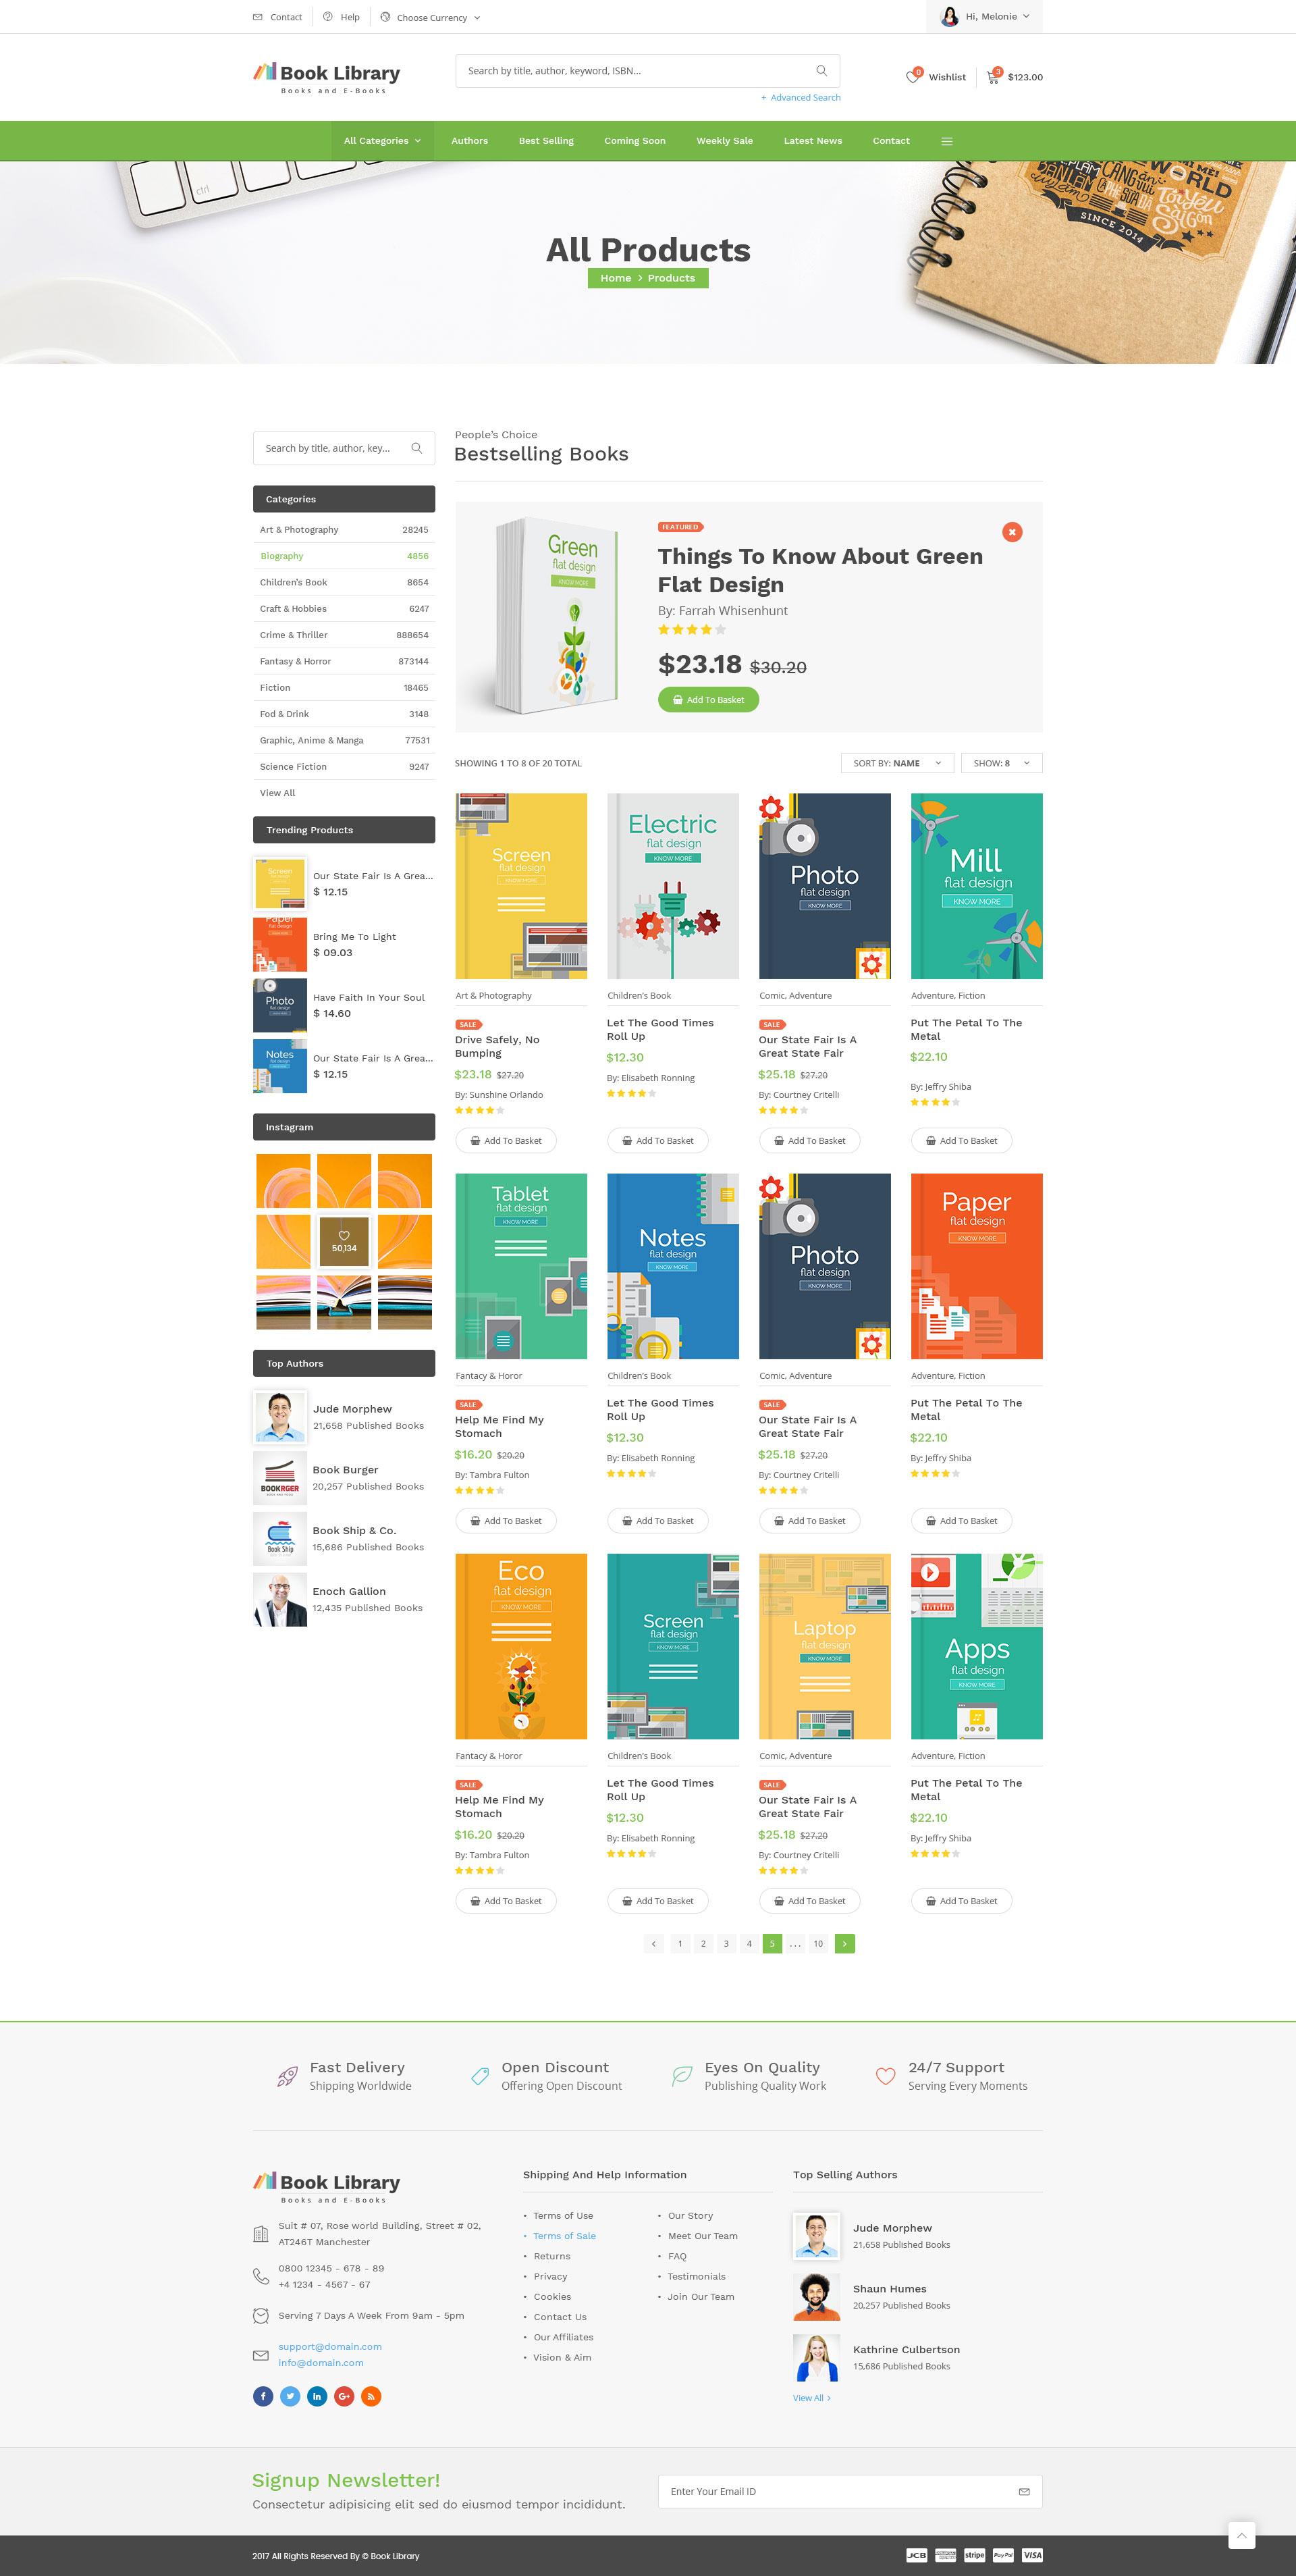 book library jpg files08_product gridjpg